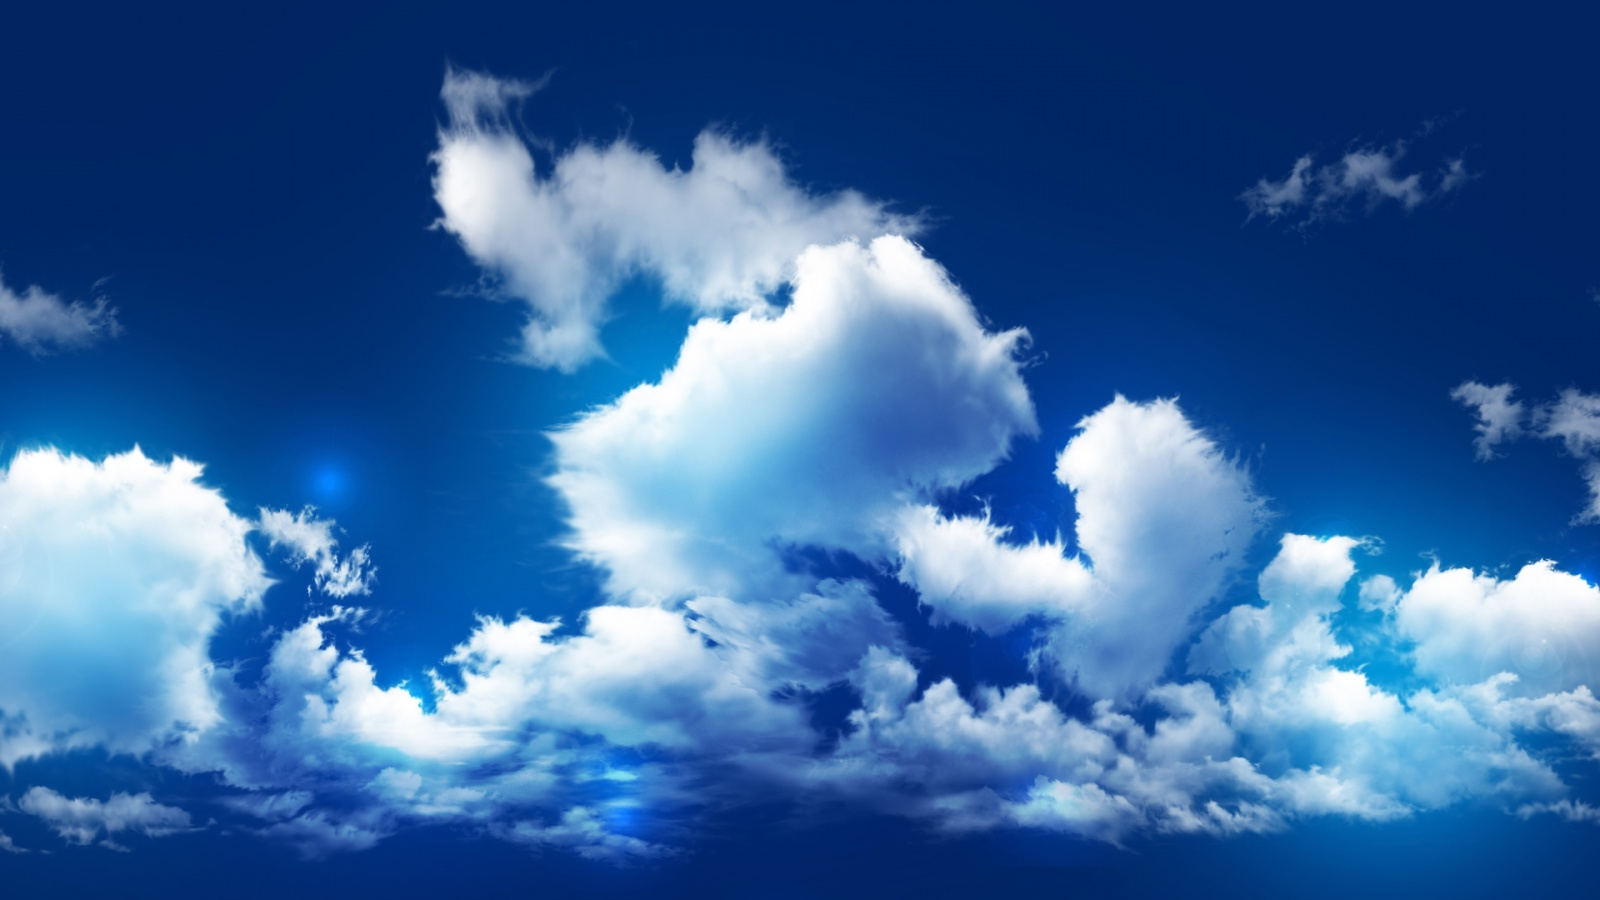 ... x 1080 Original. Description: Download Cloudy Sky ...